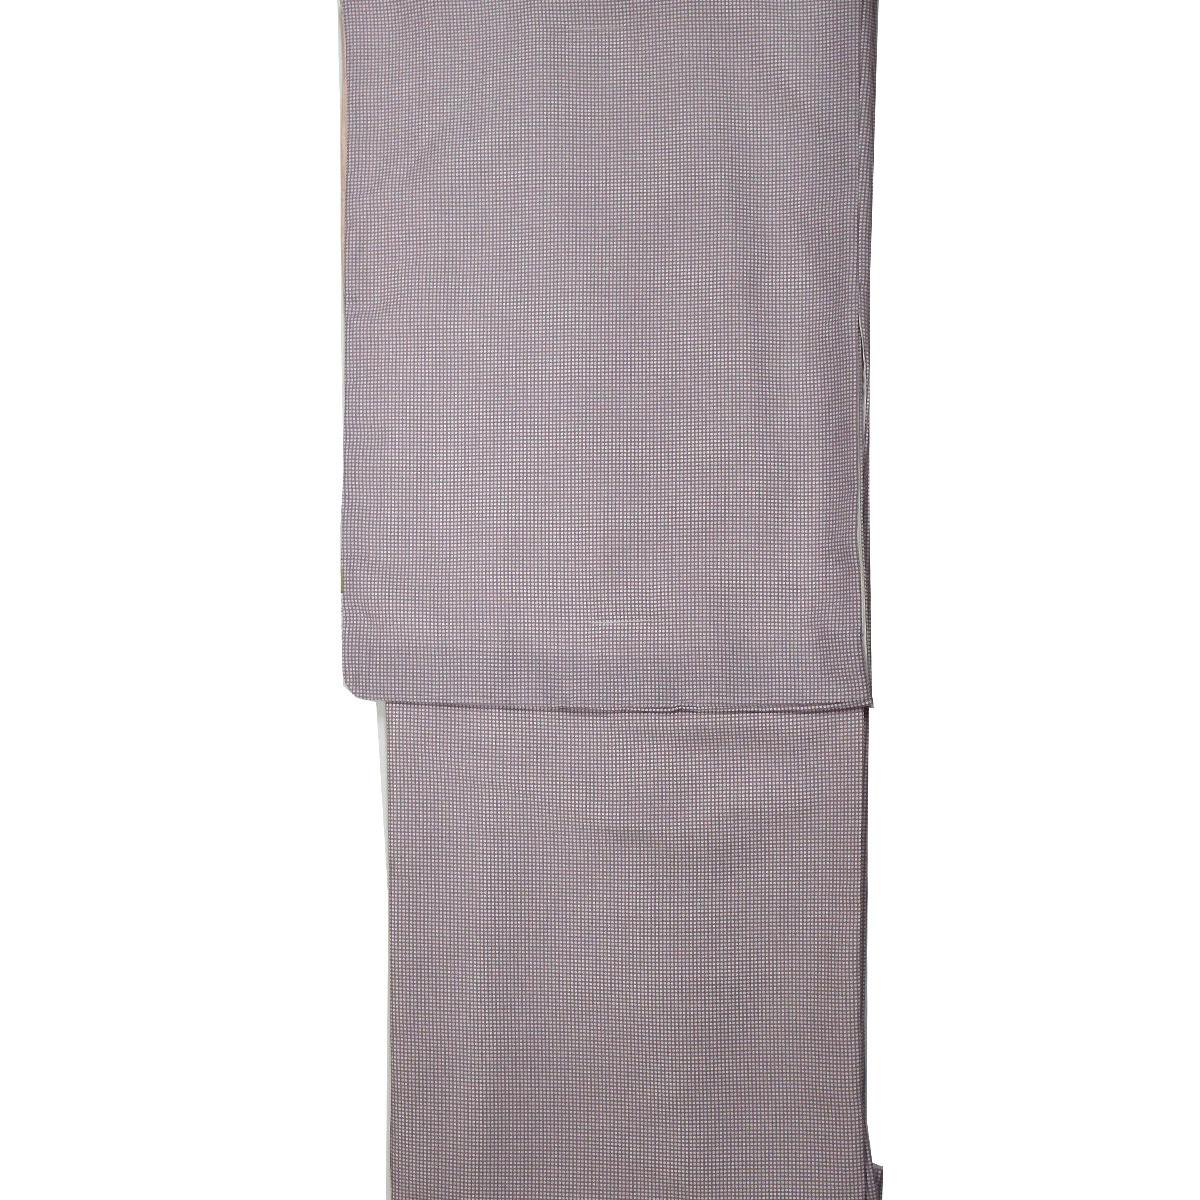 【L寸】 洗える着物 【 袷 】【 江戸小紋 】 【 仕立て上がり 】 洗える 着物 単品商品番号d914-62